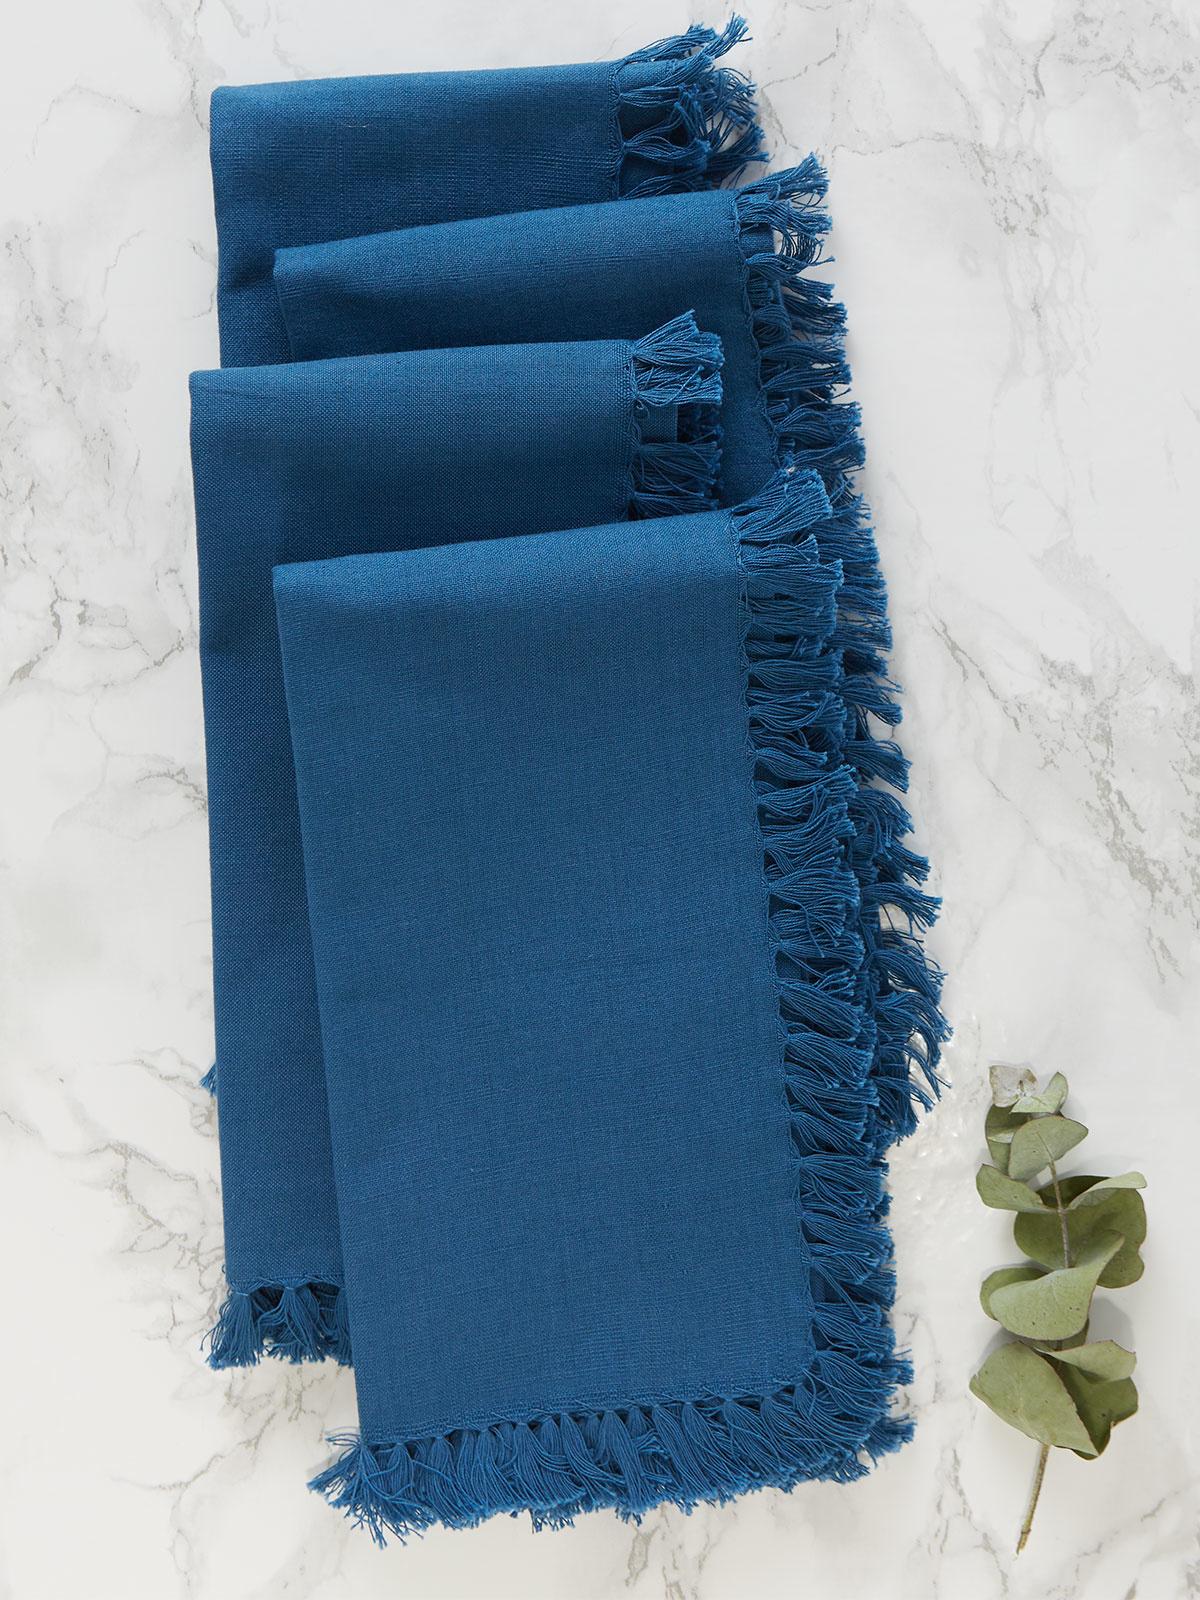 APRIL CORNELL BLUE NAPKINS-1